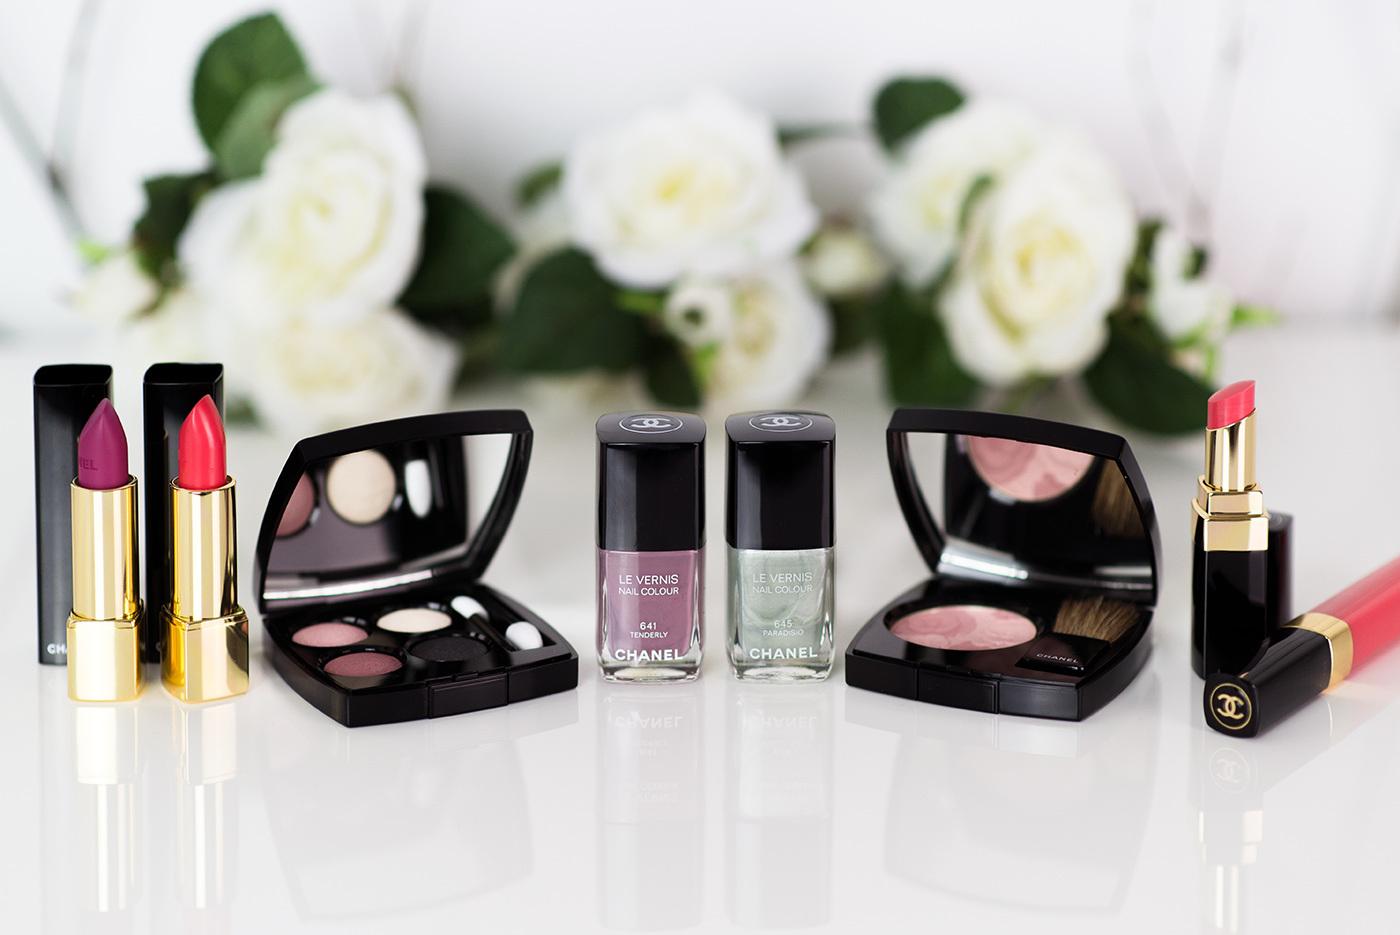 Kozmetika Chanel